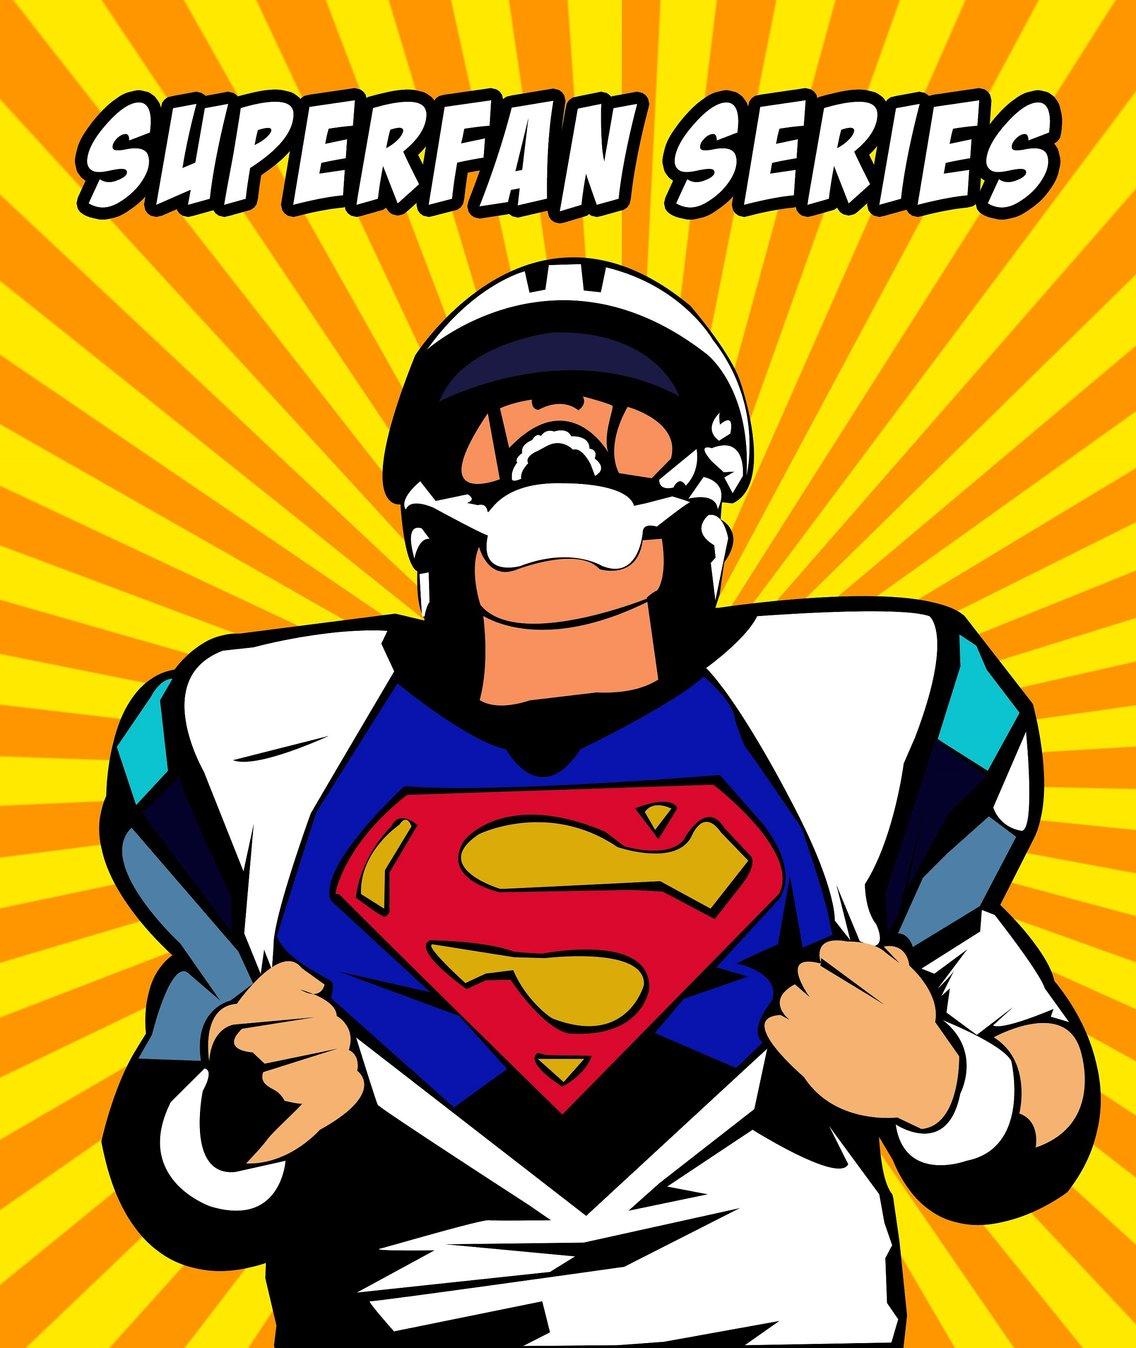 Superfan Series - imagen de portada